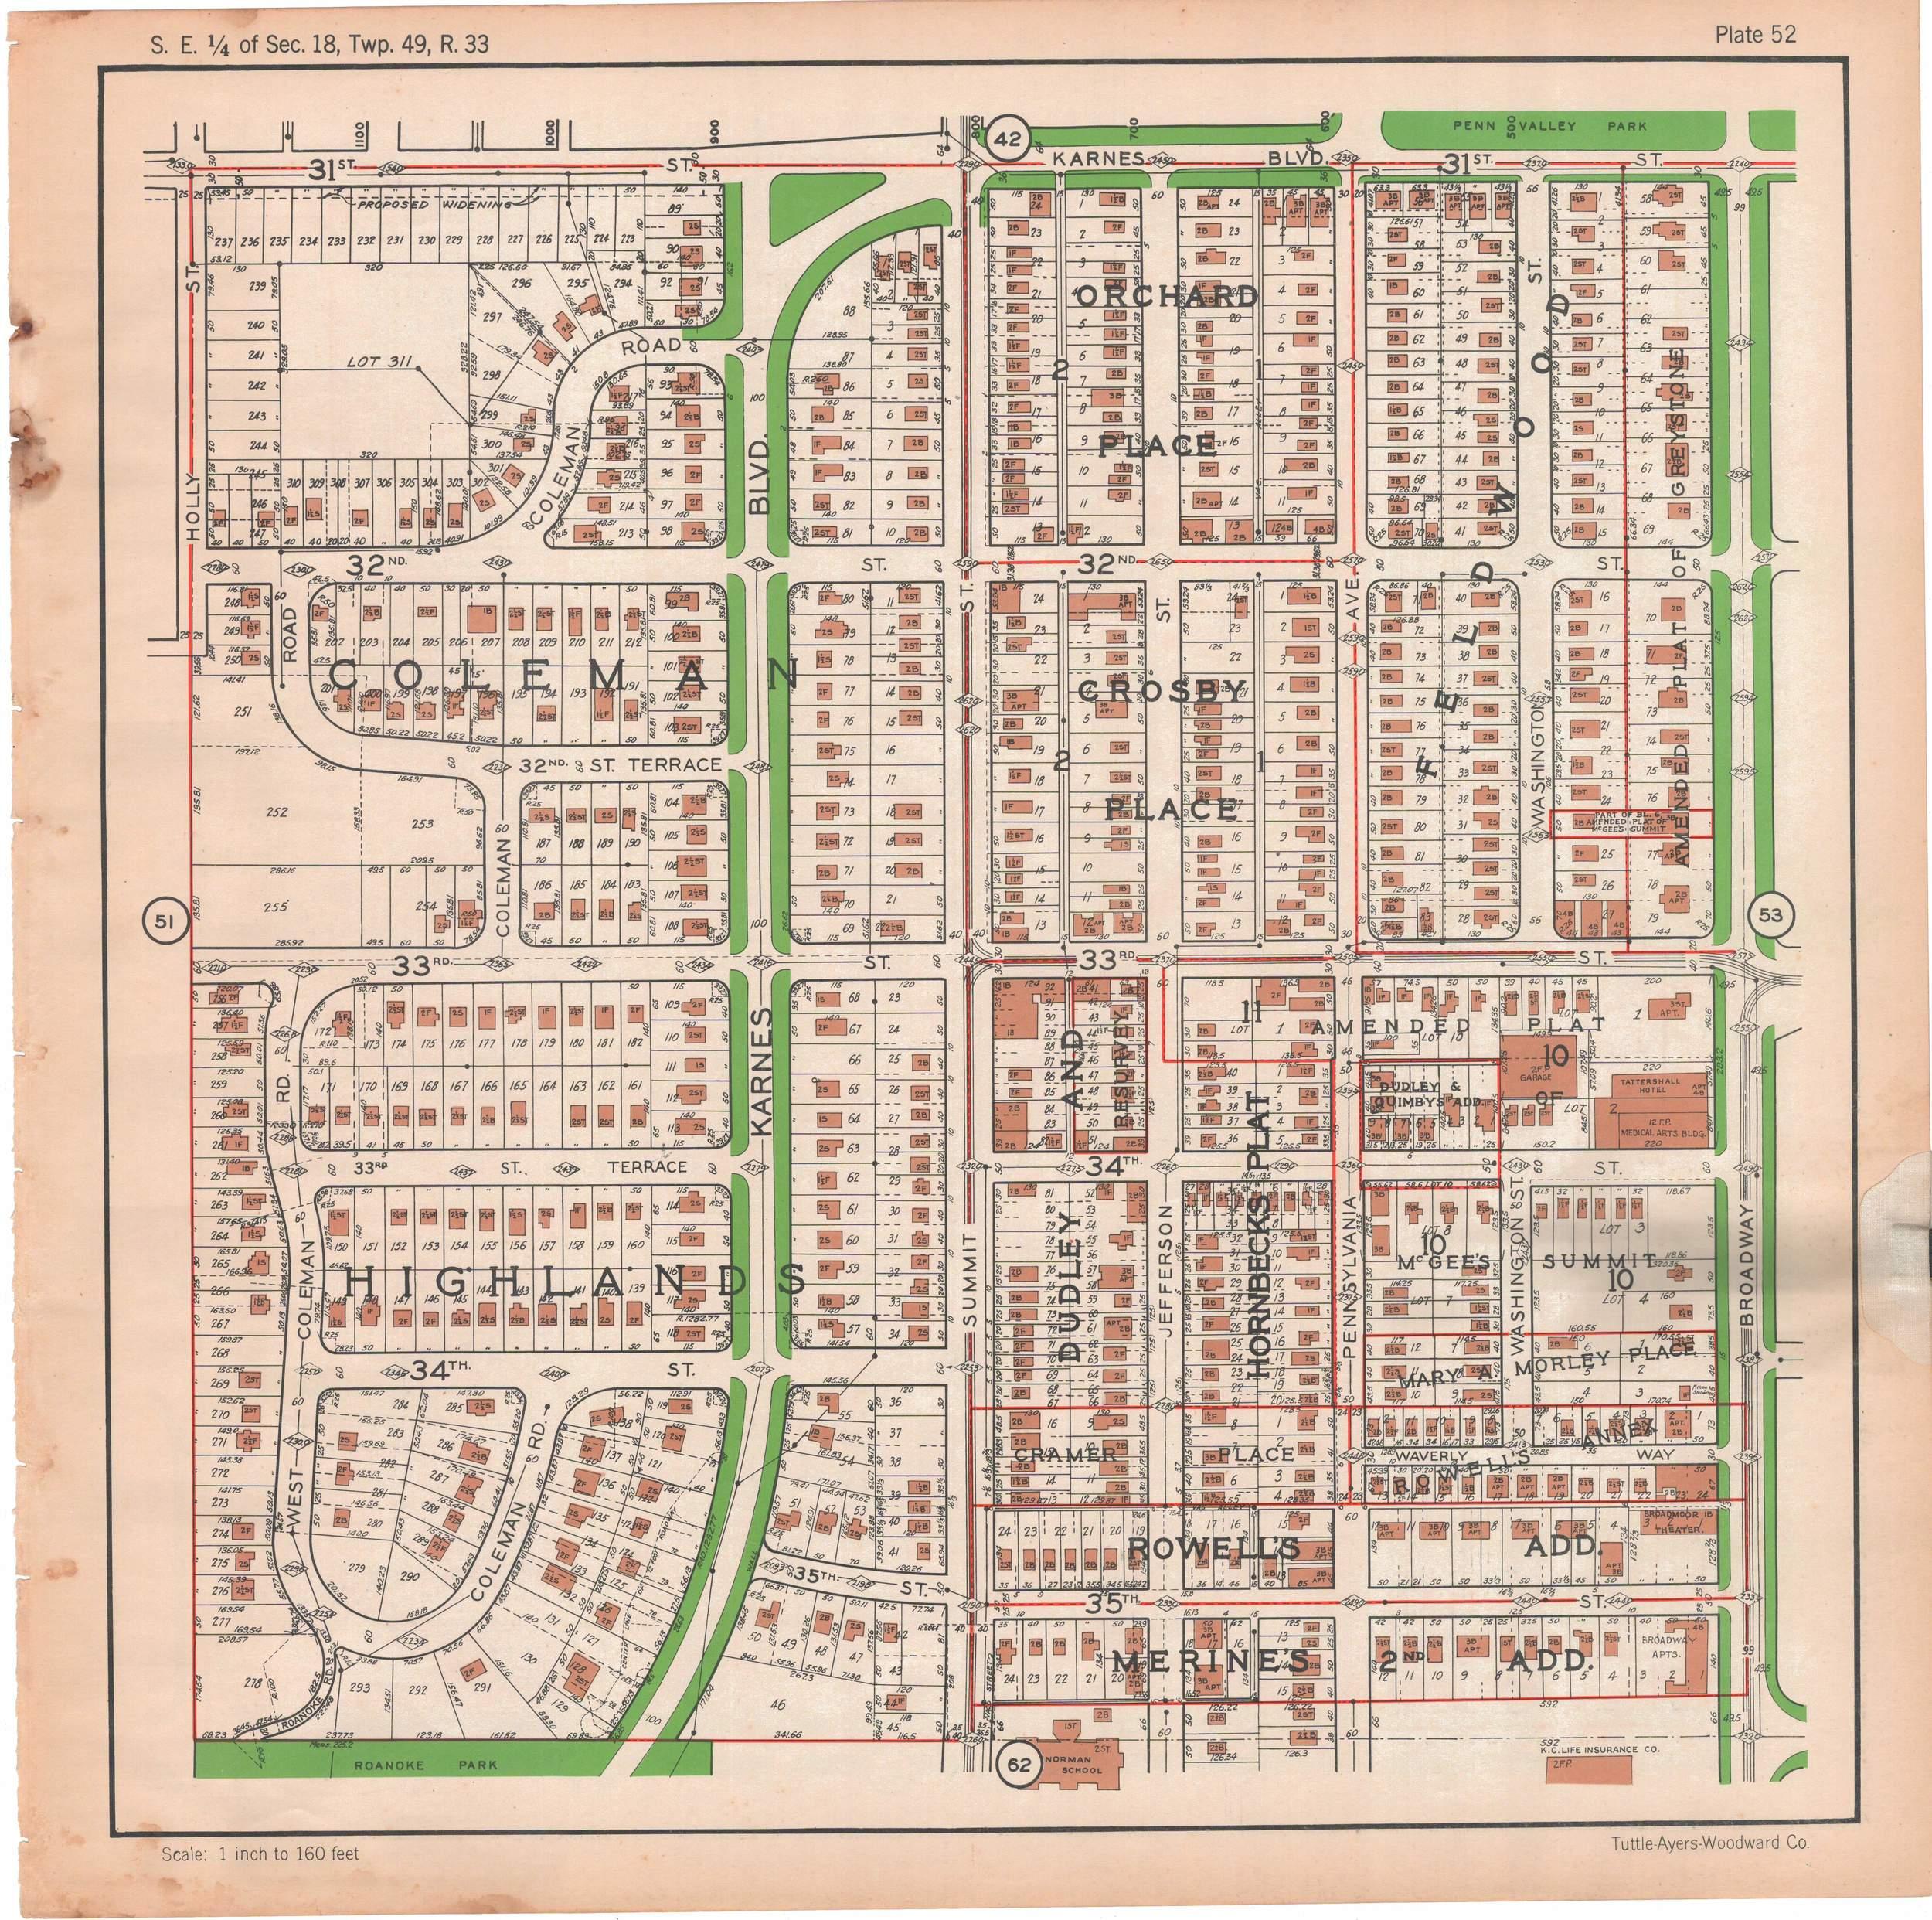 1925 TUTTLE_AYERS_Plate 52.JPG